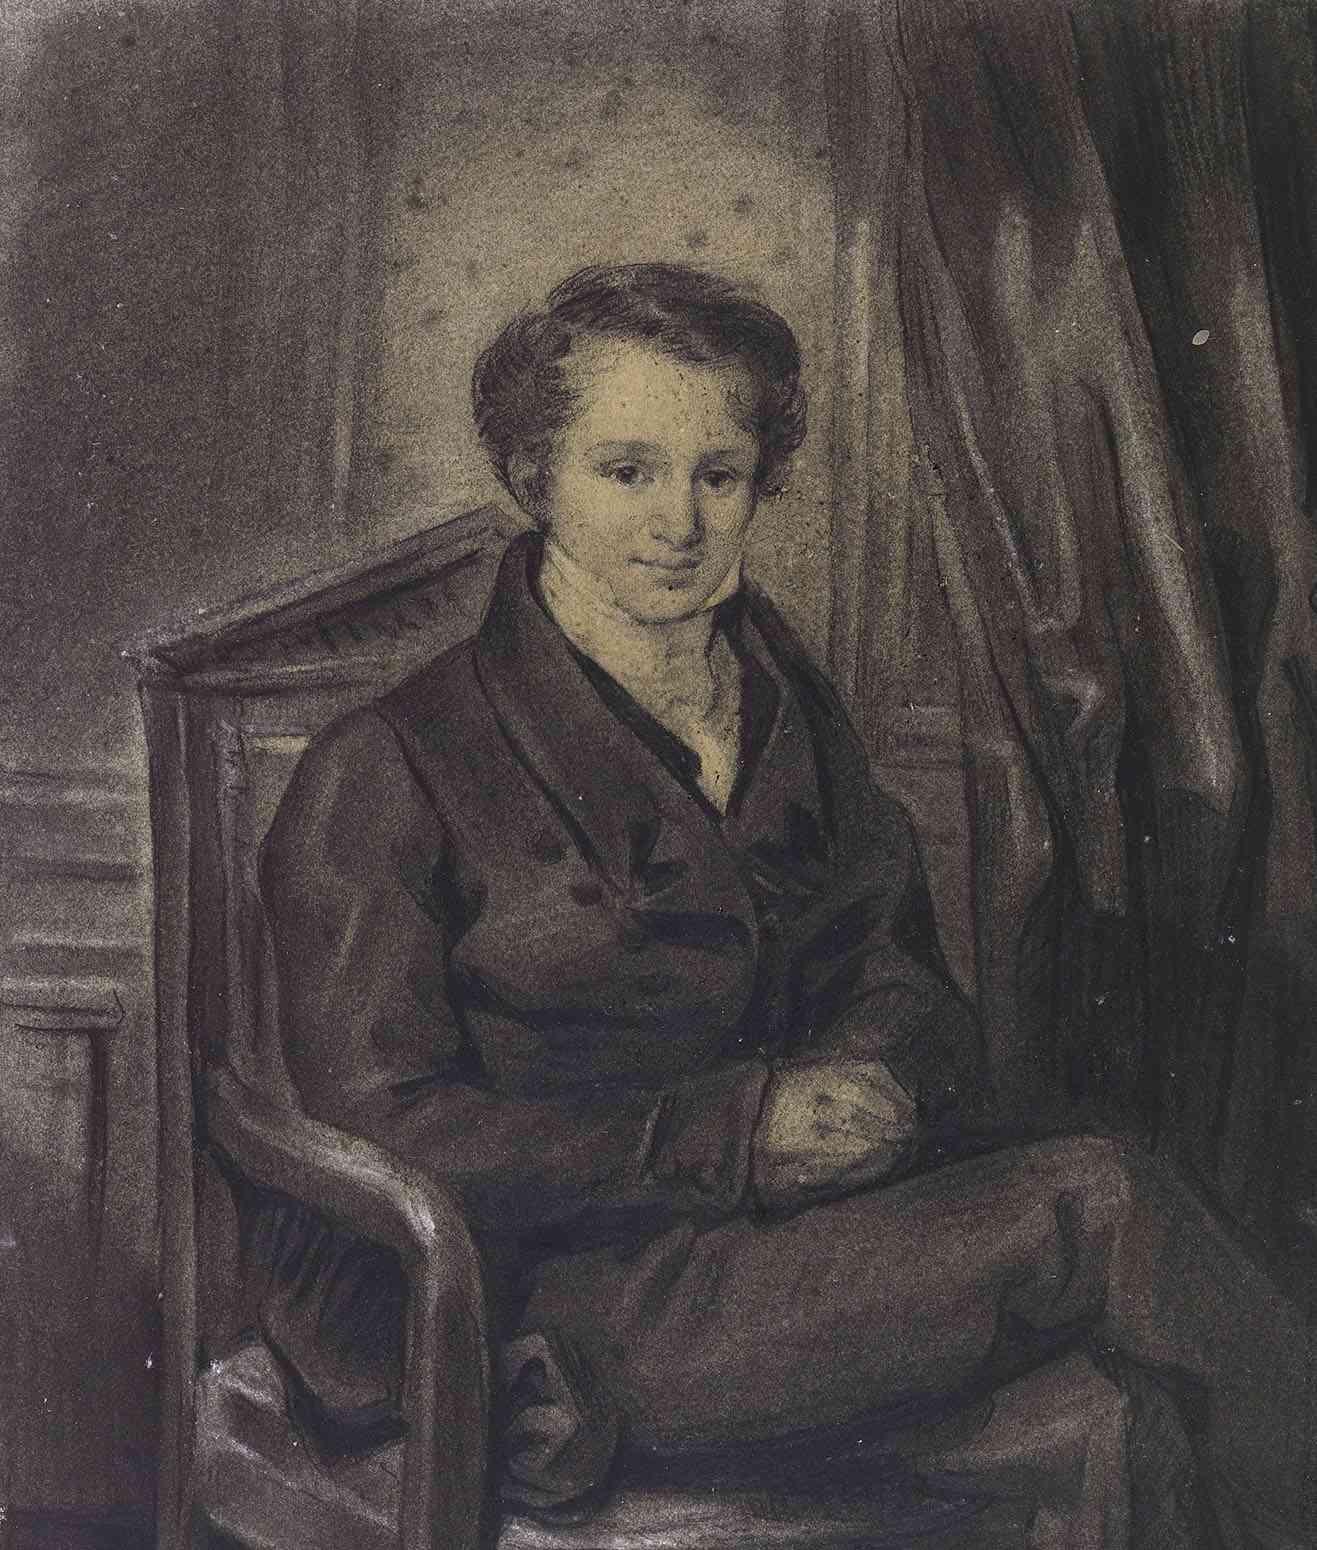 Victor Hugo circa 1821